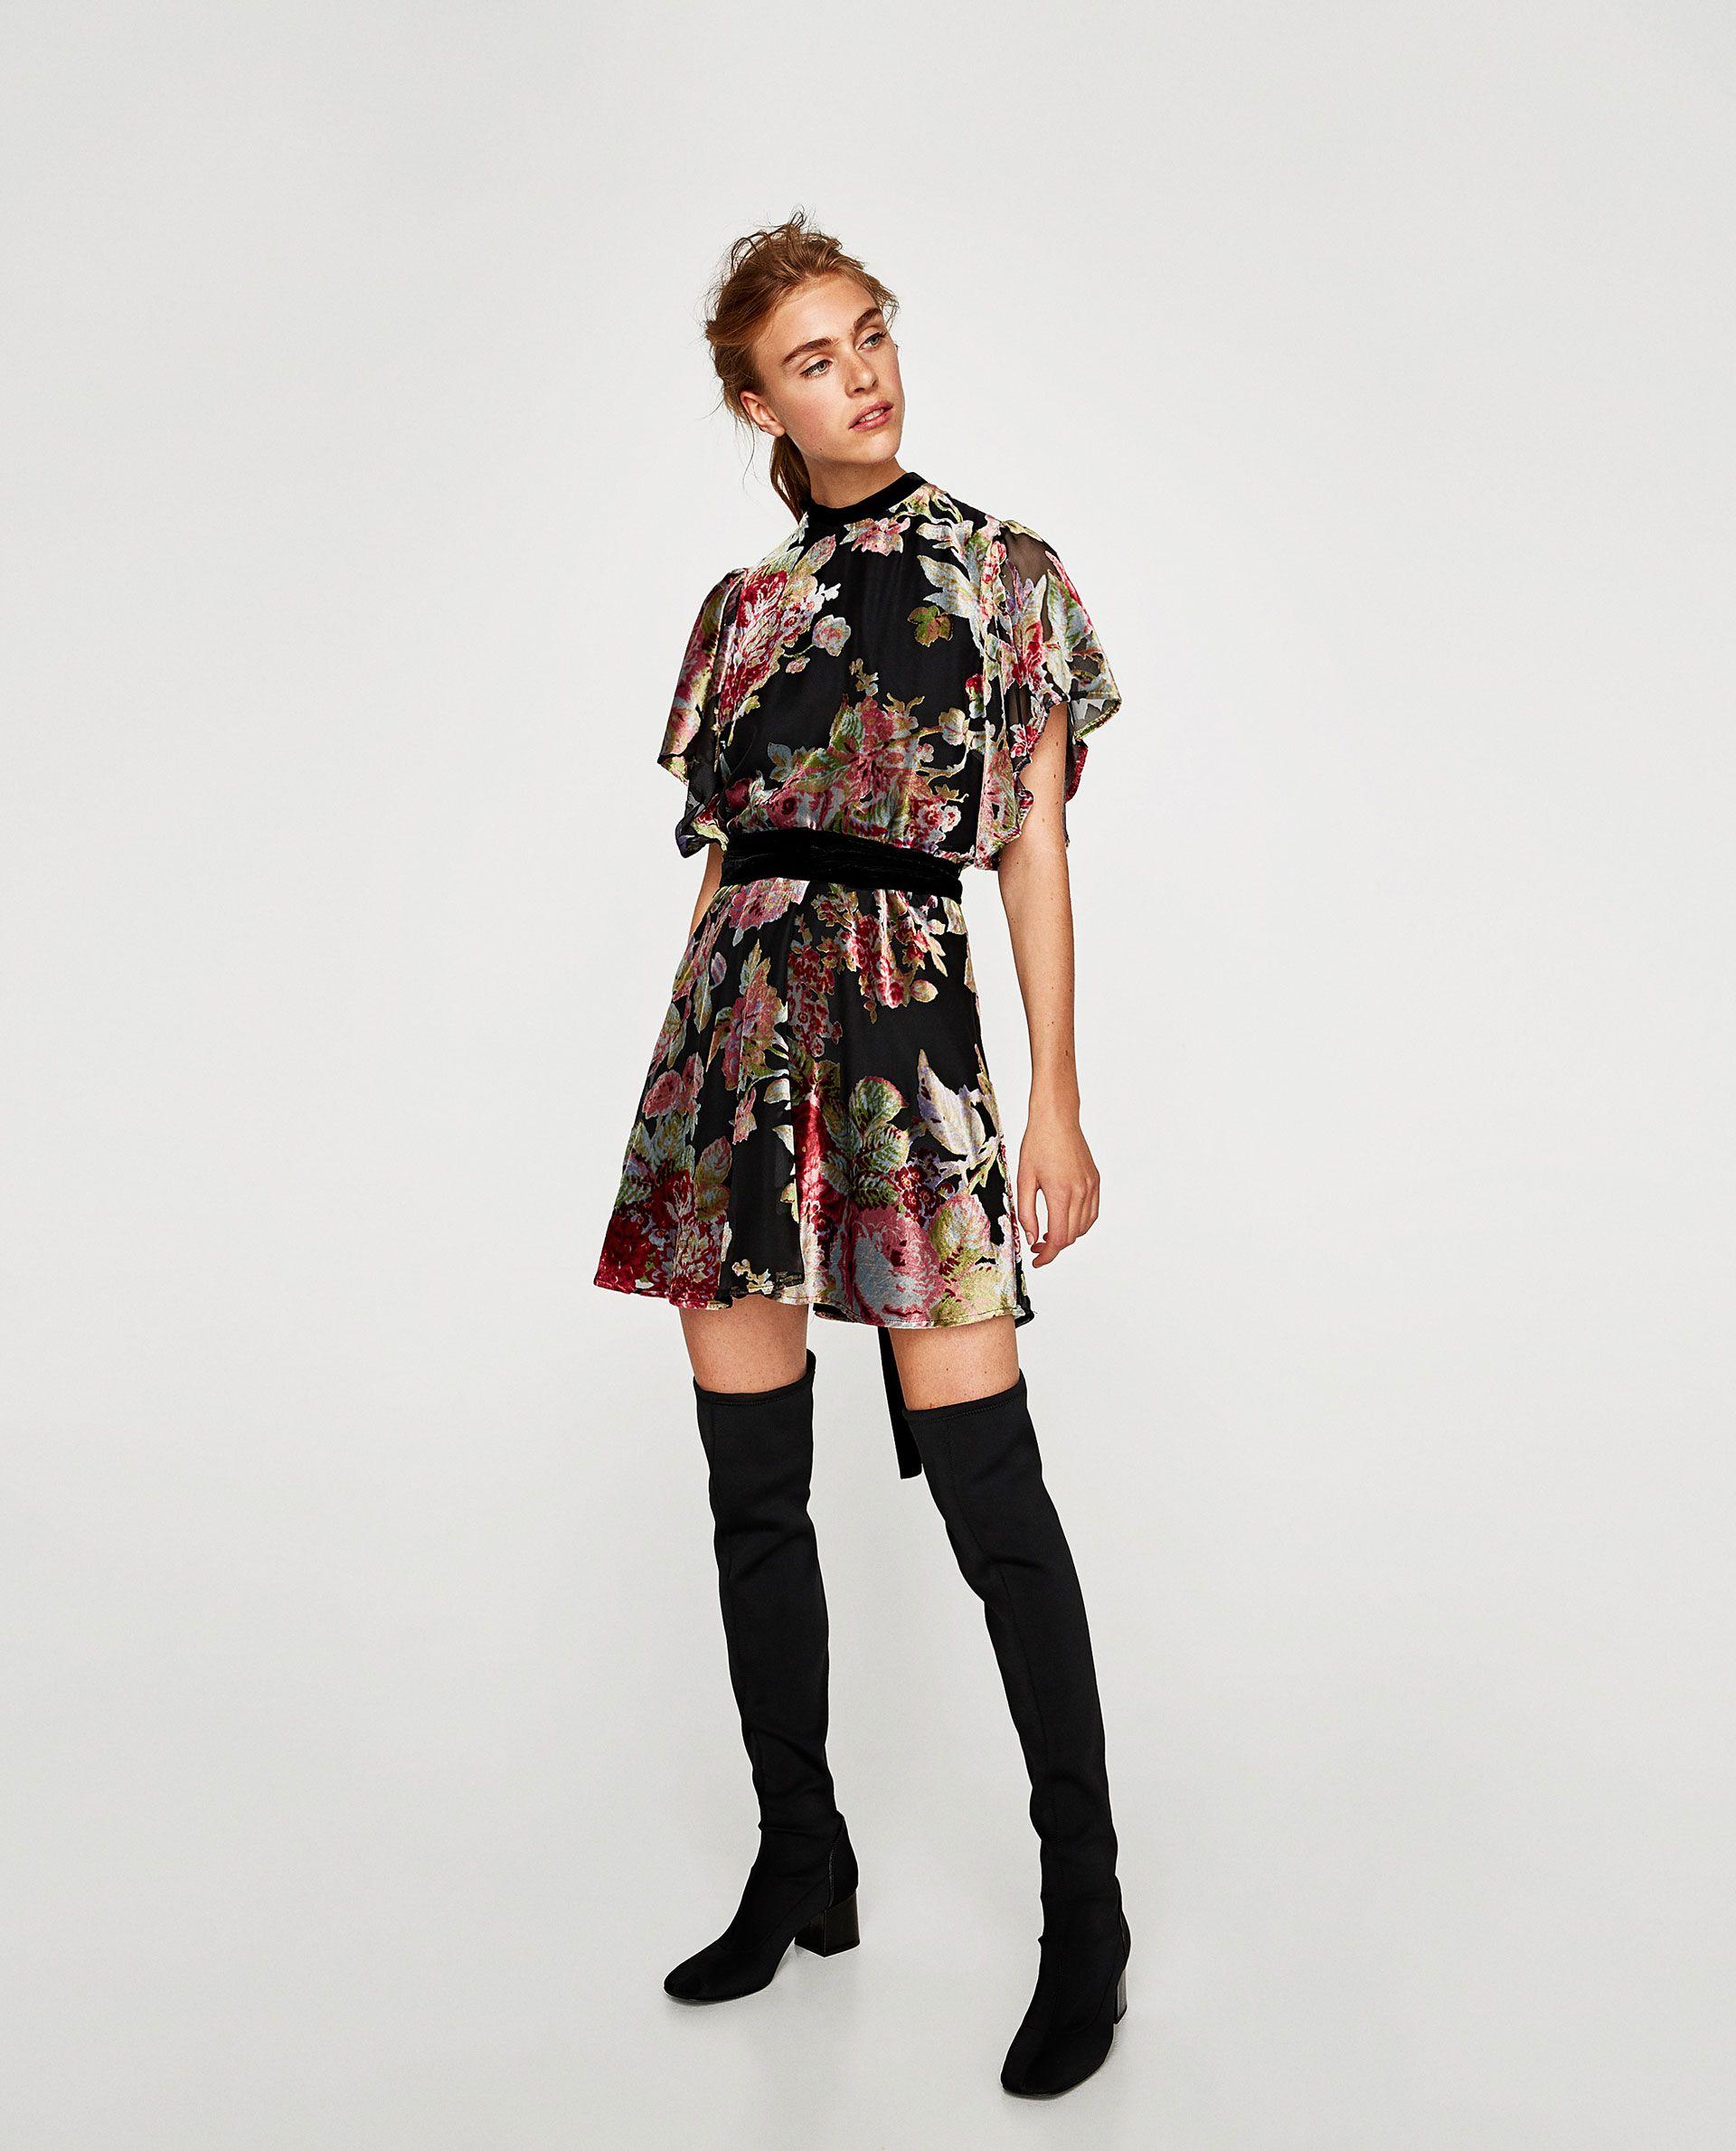 9081bc0e680e VESTIDO MINI TERCIOPELO DEVORADO | Fashion - Zara SS/FW15 | Zara ...